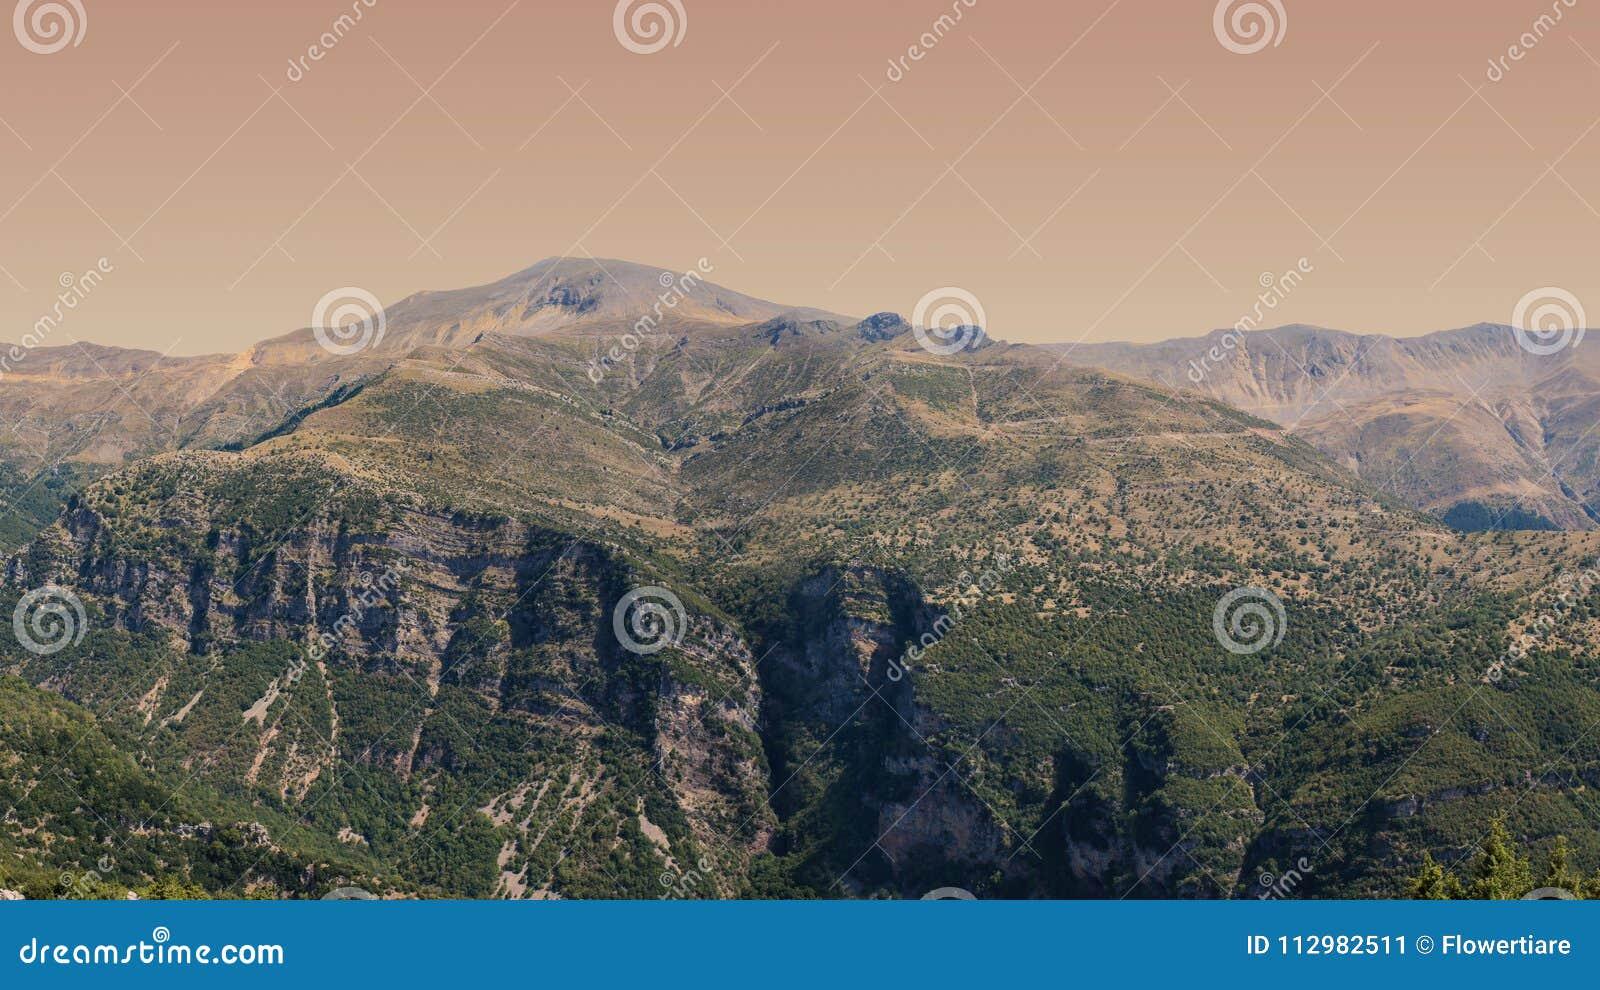 Banner of Panoramic view of mountain in National Park of Tzoumerka, Greece Epirus region. Mountain